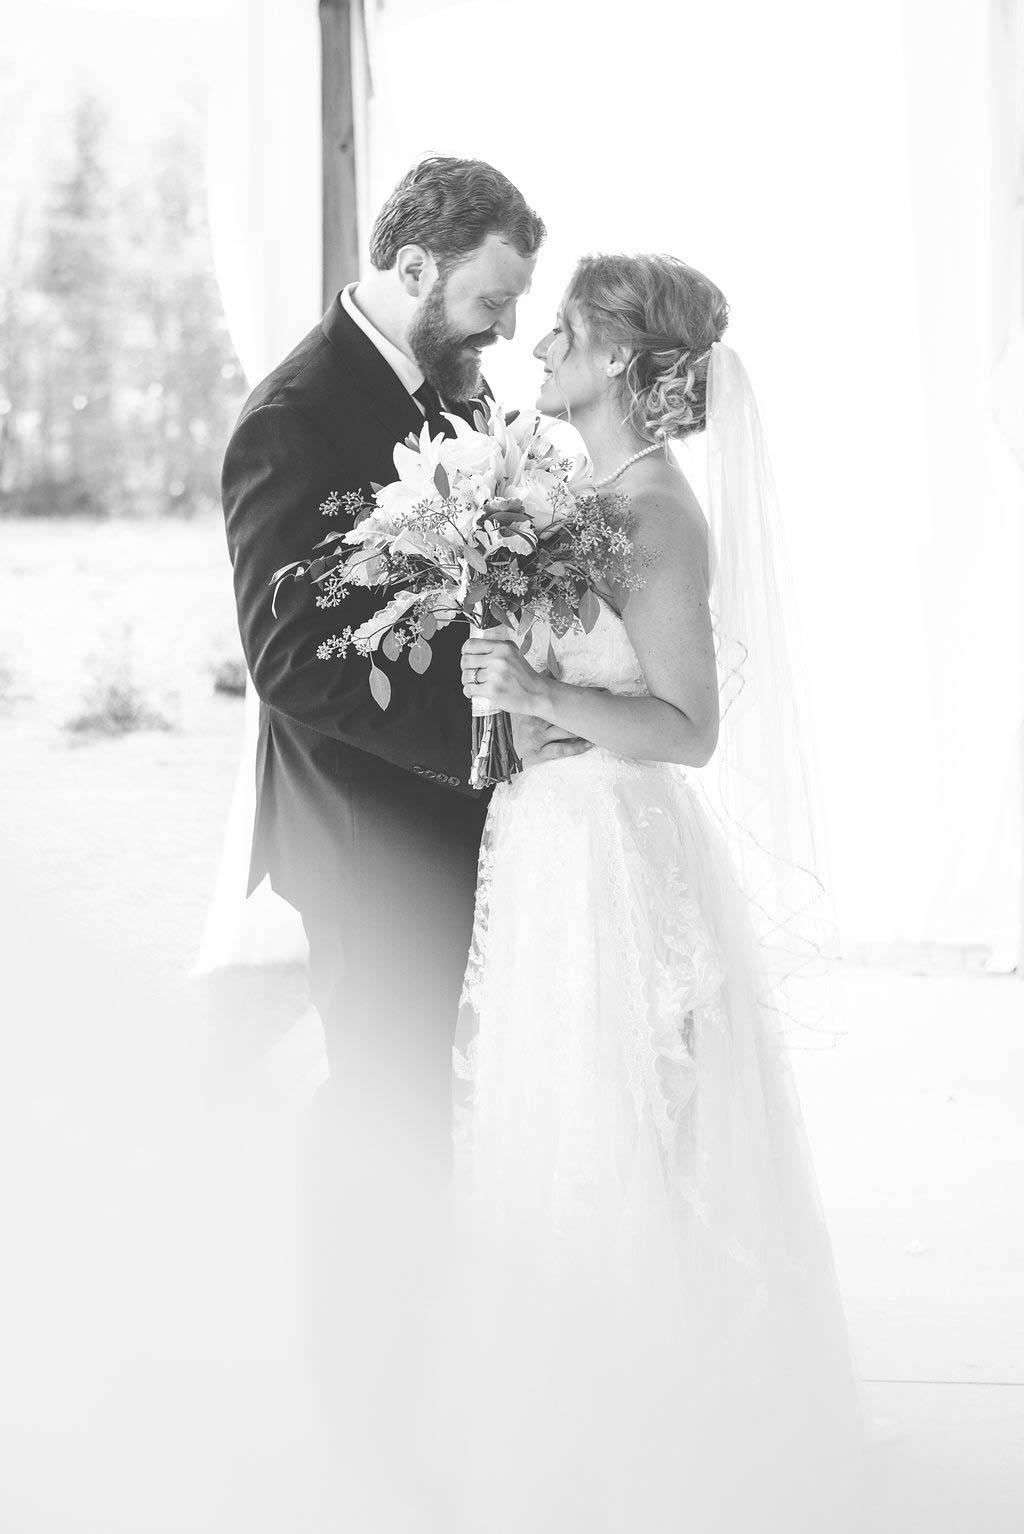 Becca_Nick_Engagement-44.jpg